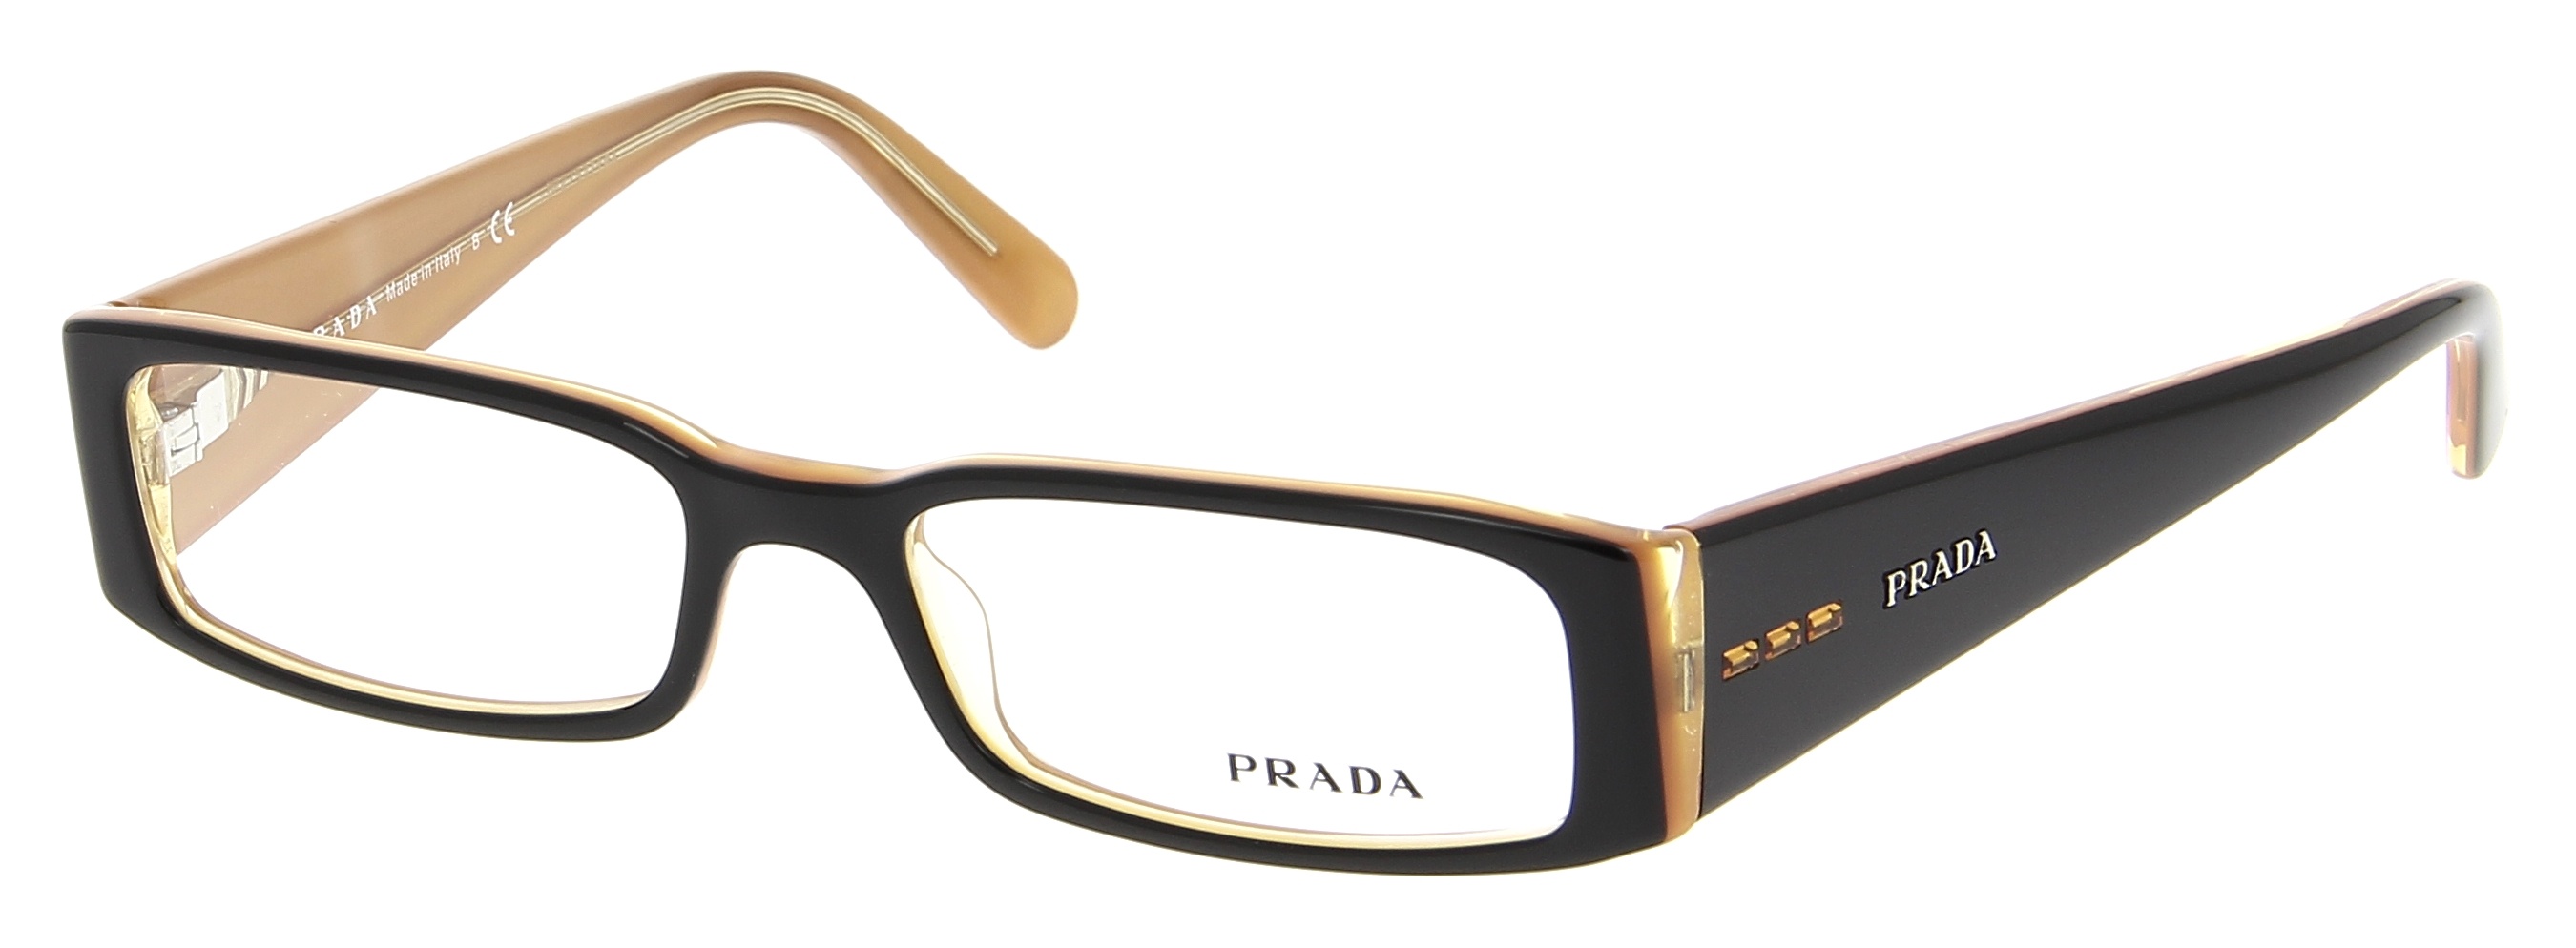 lunettes de vue prada pr 10fv 2bx101 51 16 femme noir orange rectangle cercl e tendance. Black Bedroom Furniture Sets. Home Design Ideas